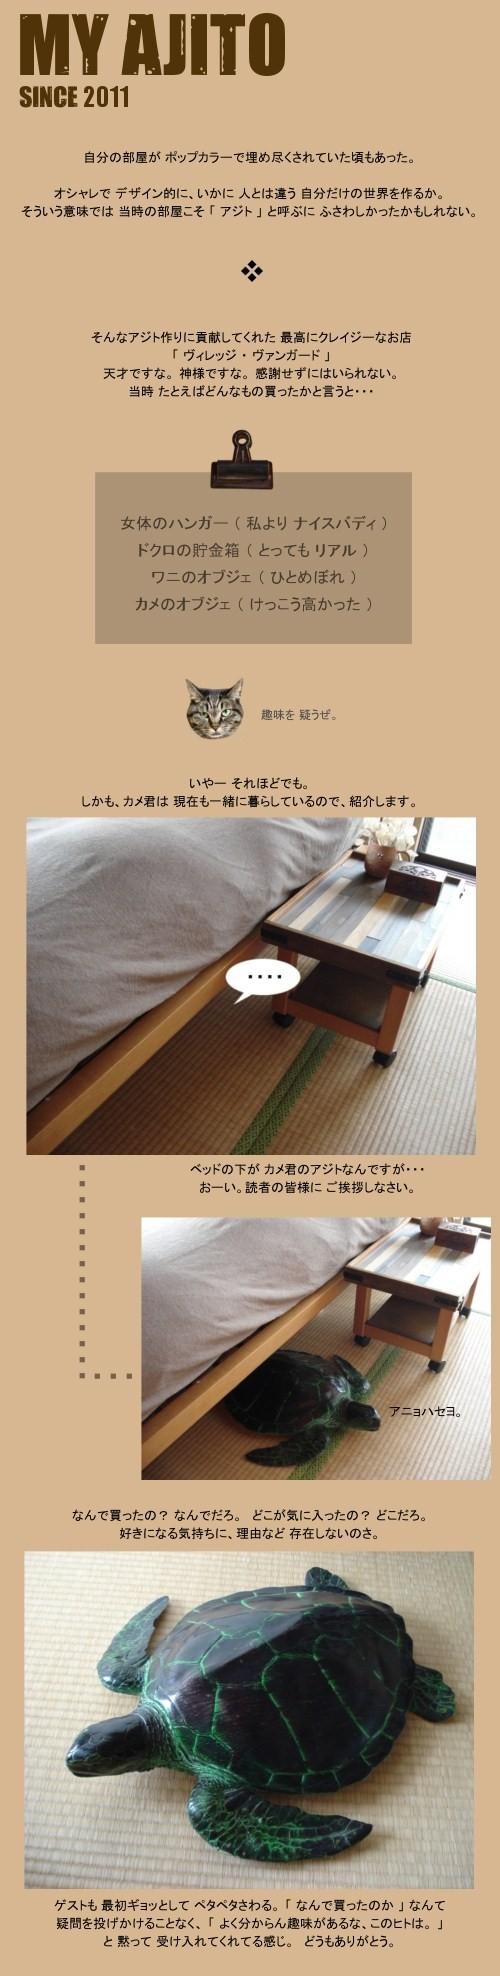 kame_wb_1.jpg